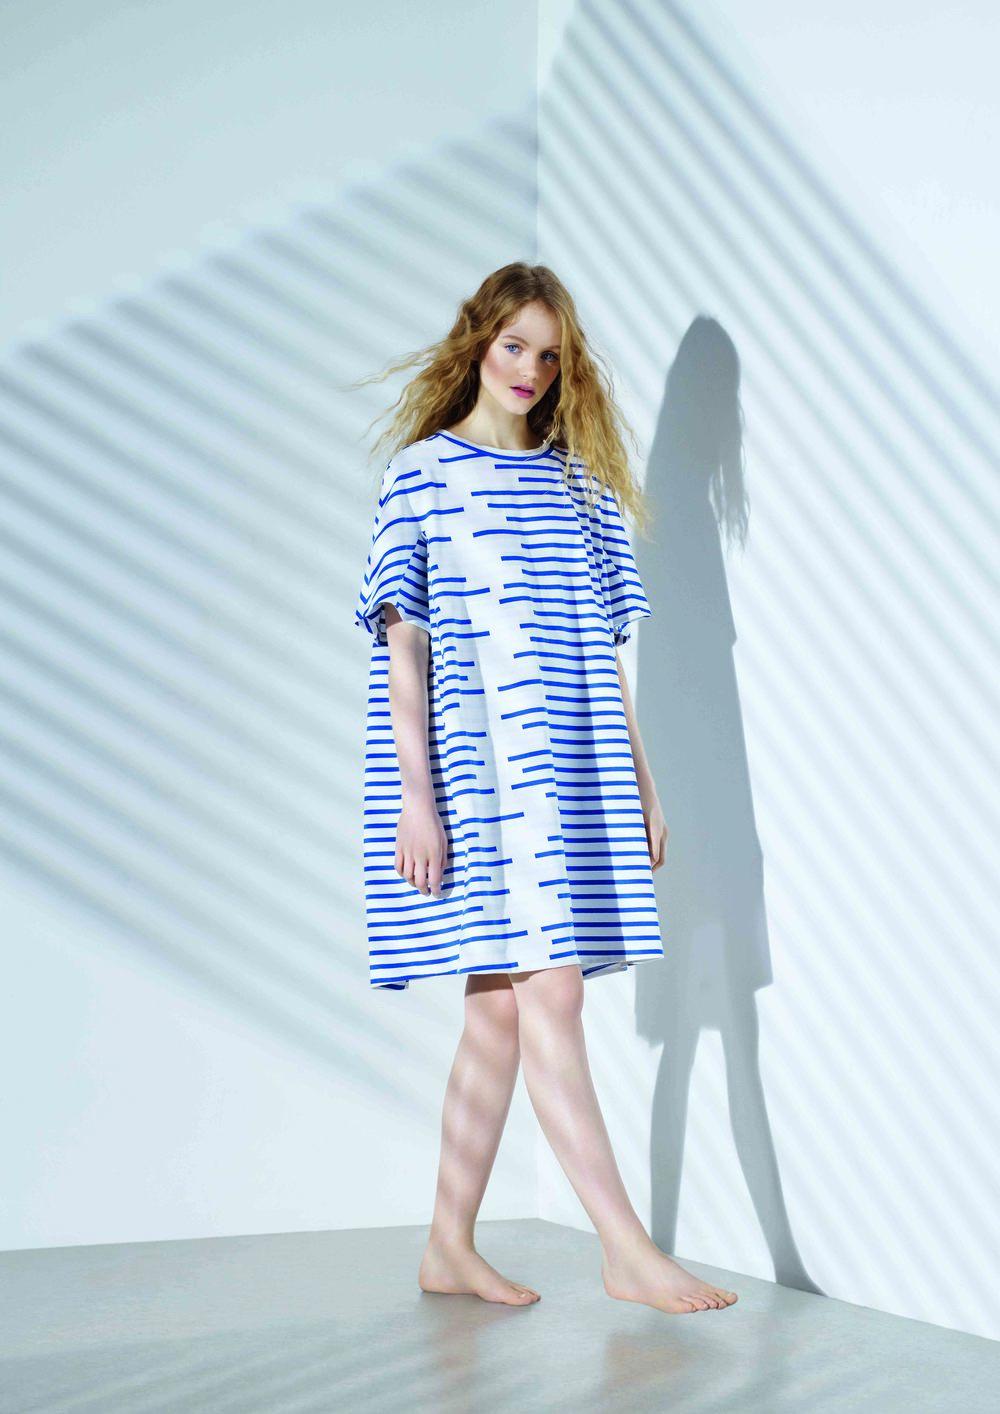 Petit Bateau x Kenta Matsushige Limited Edition Dress